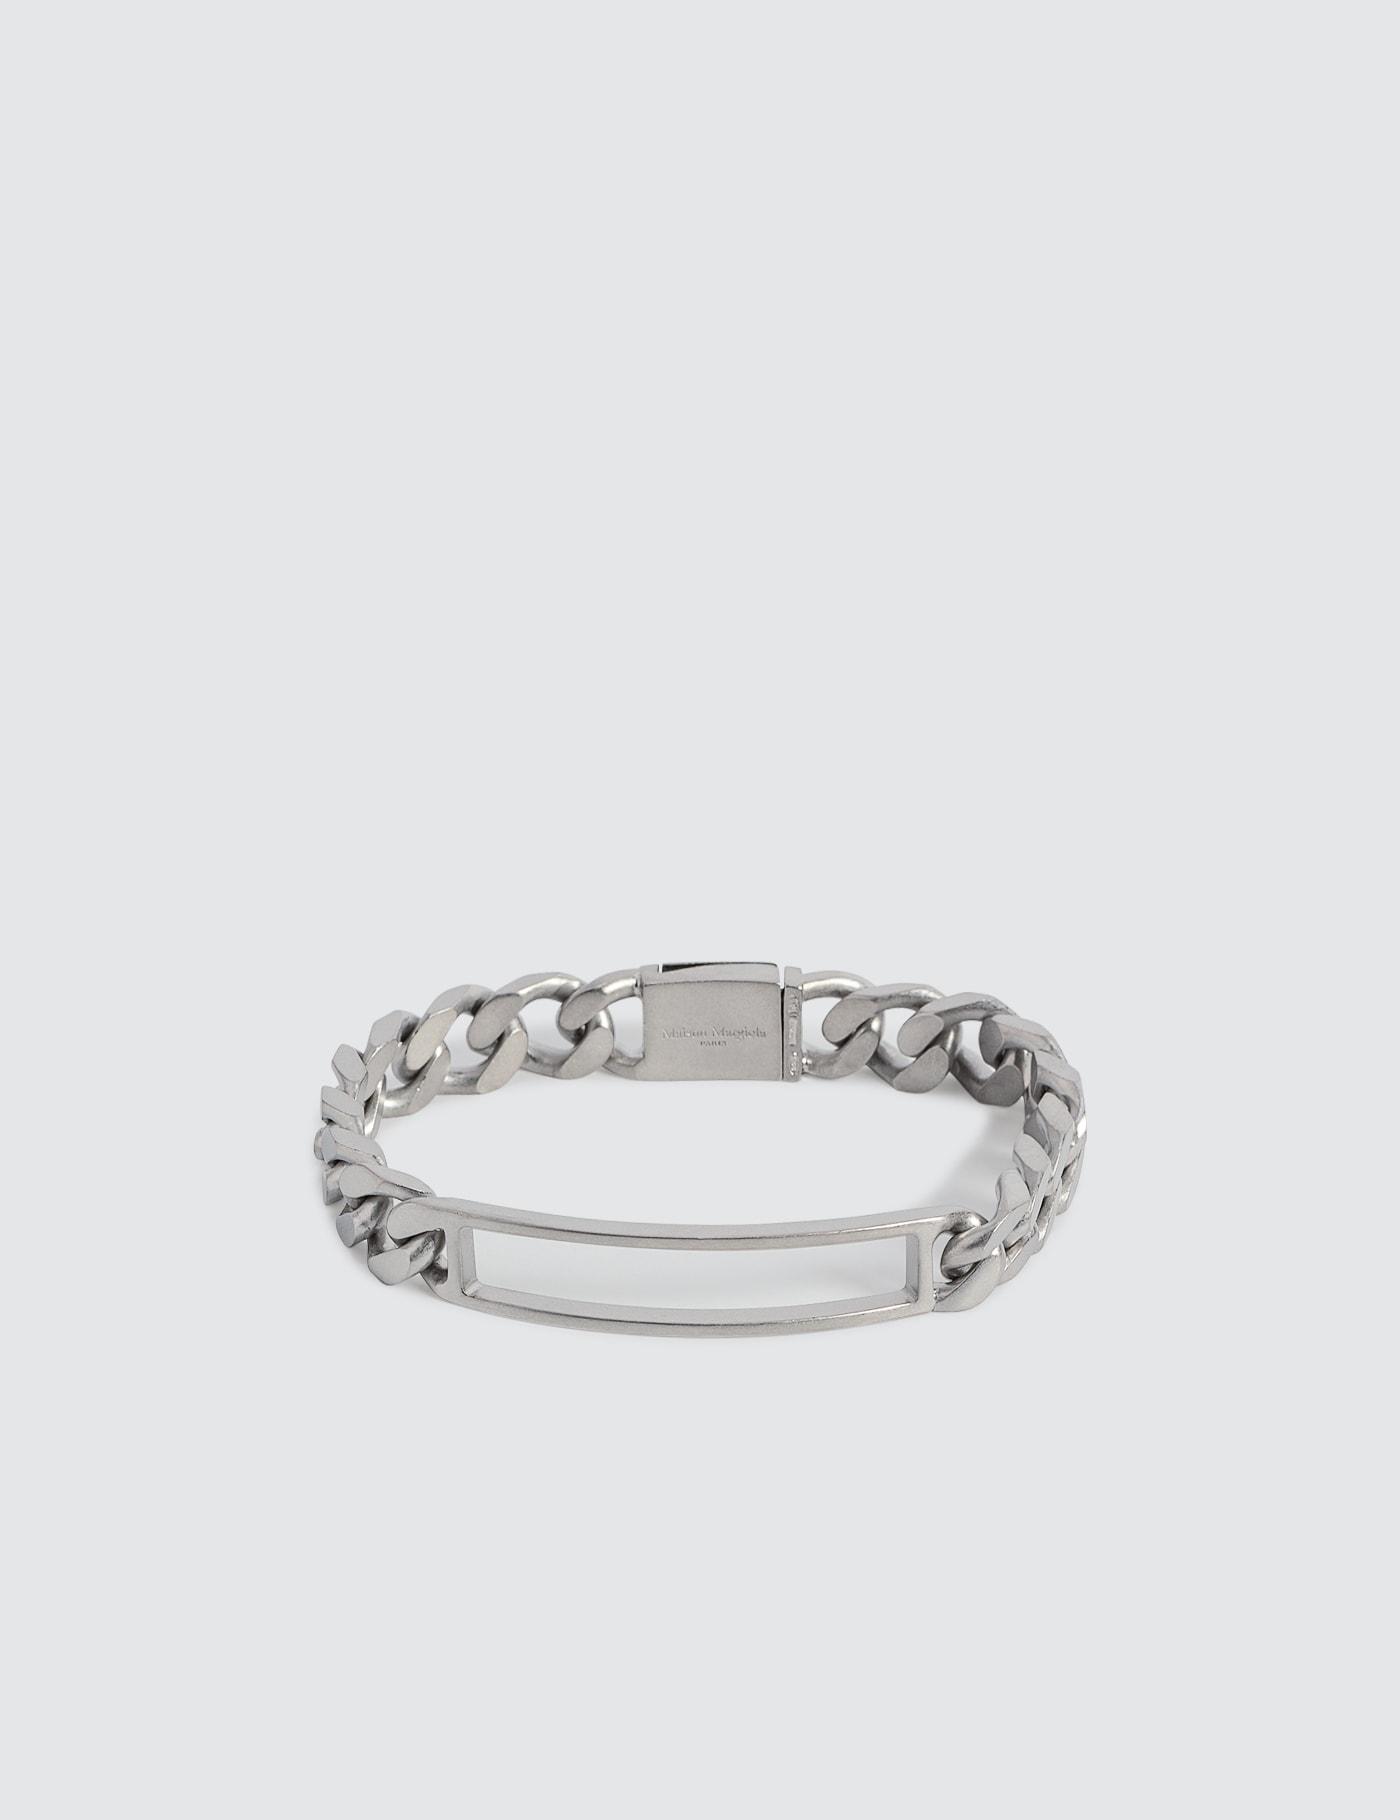 Hollow Rectangle Silver Bracelet